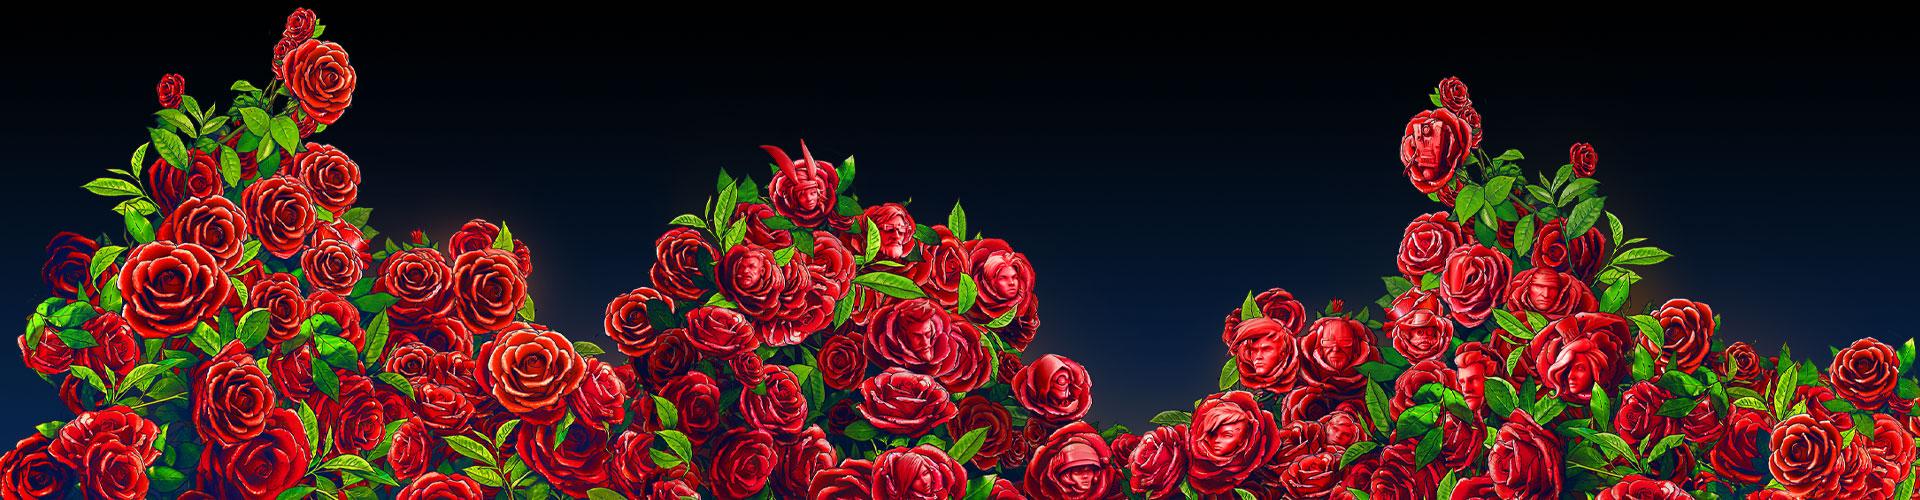 Numerosas rosas con rostro